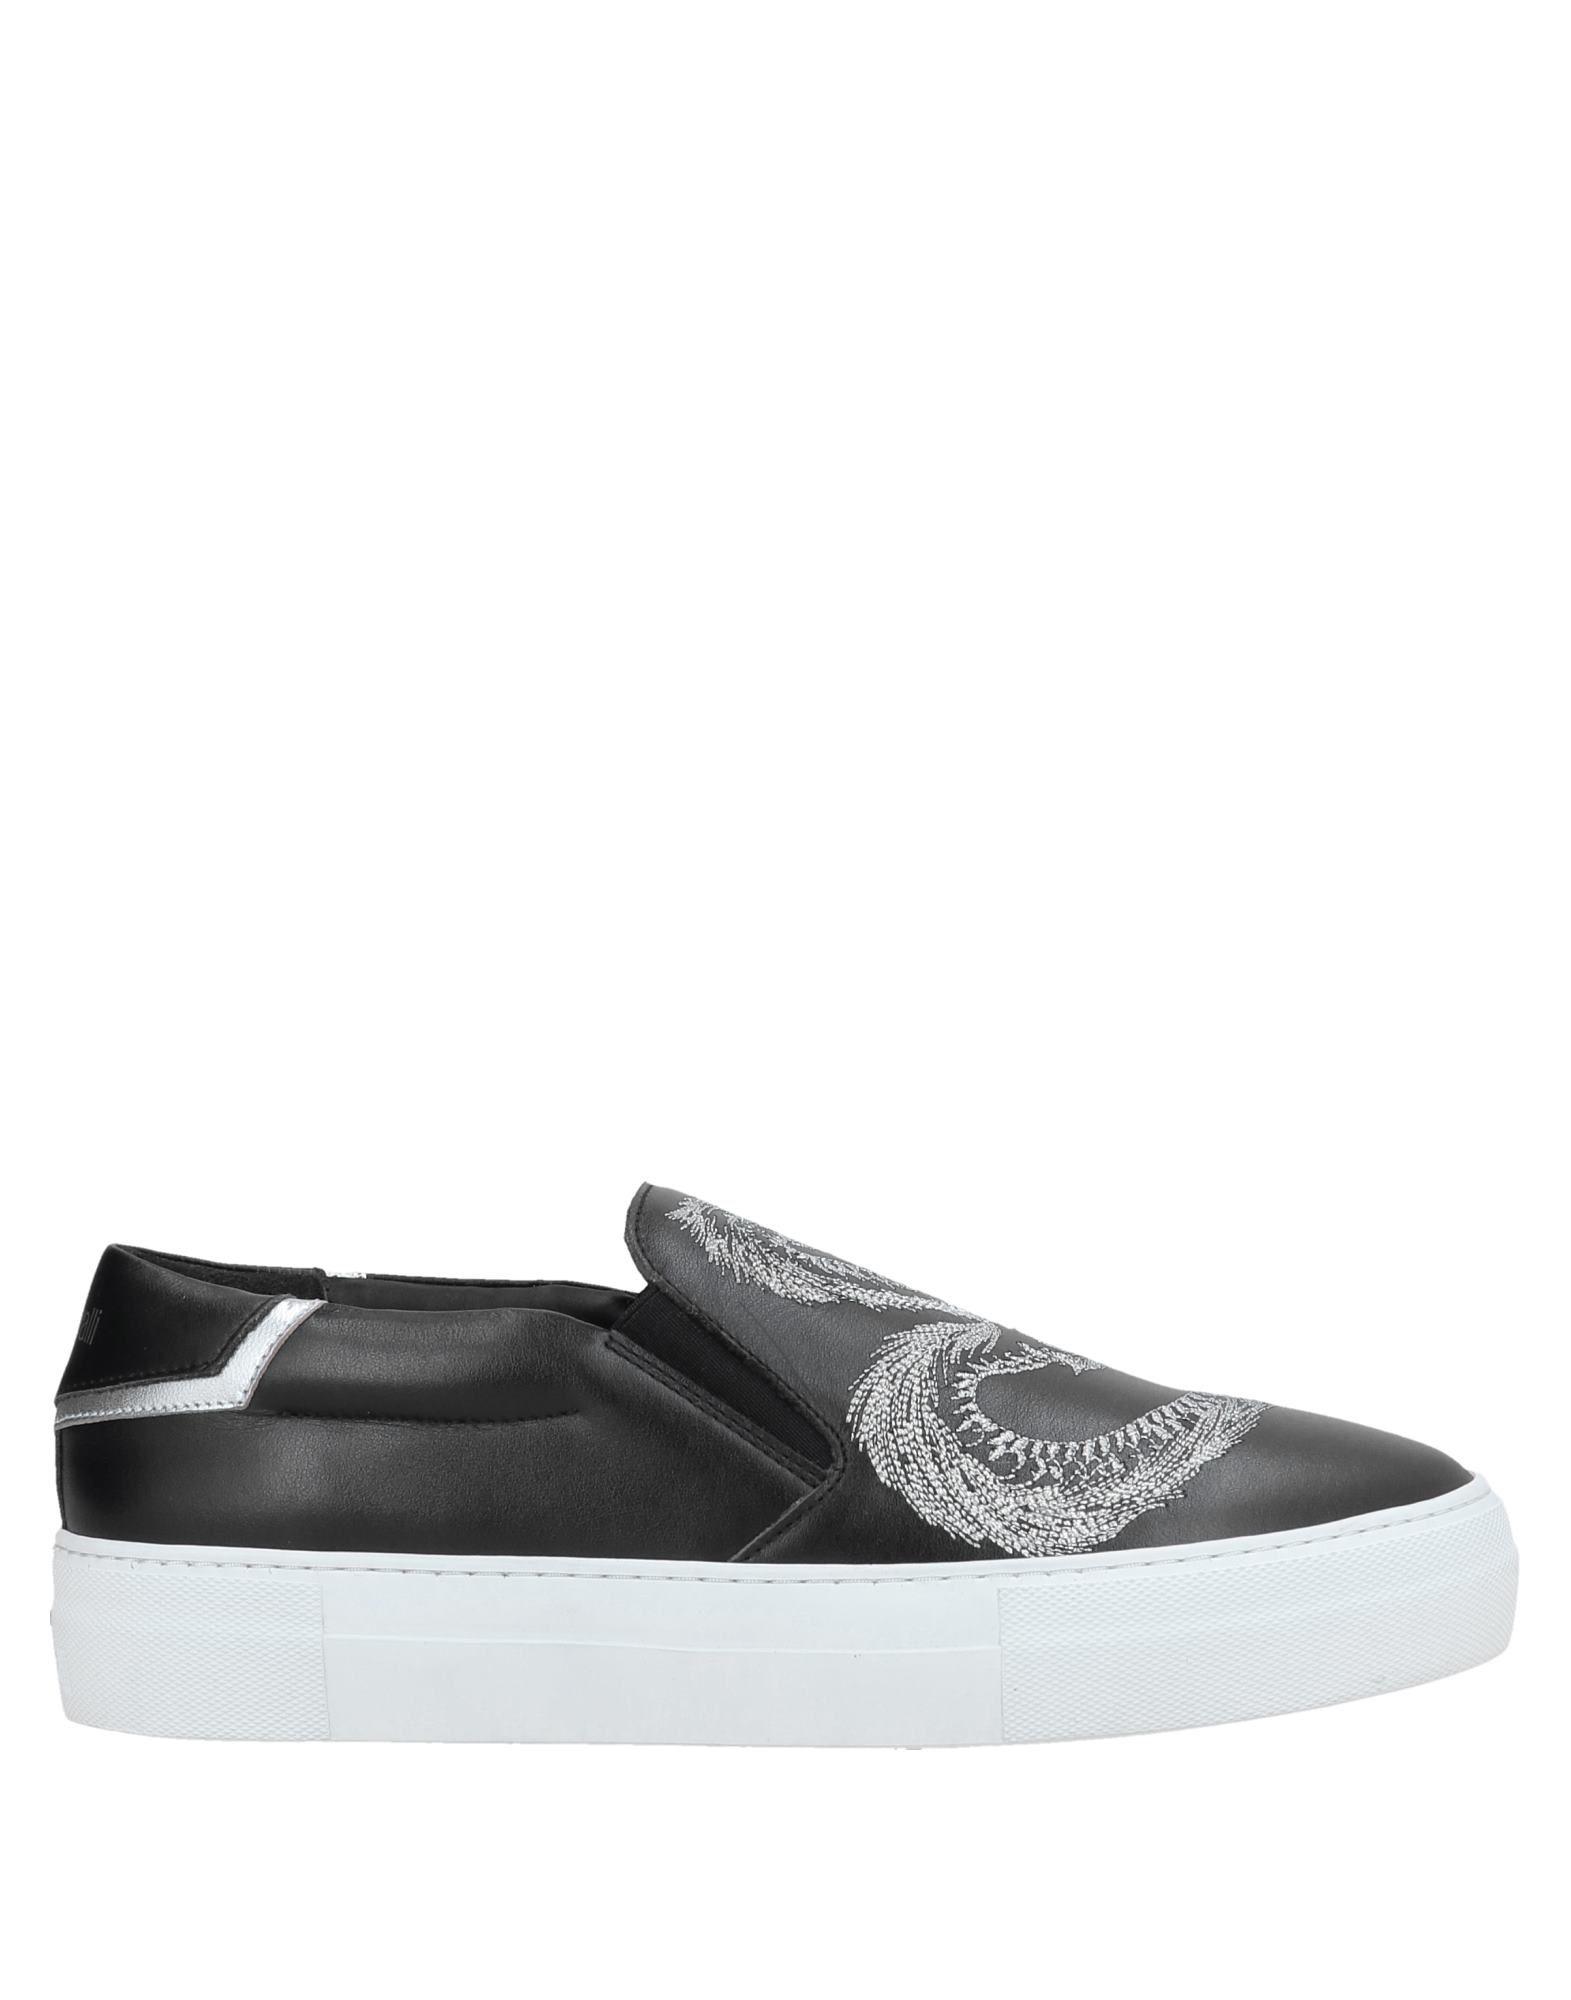 Just Cavalli Sneakers - Men on Just Cavalli Sneakers online on Men  Australia - 11570928QX 88f5ef